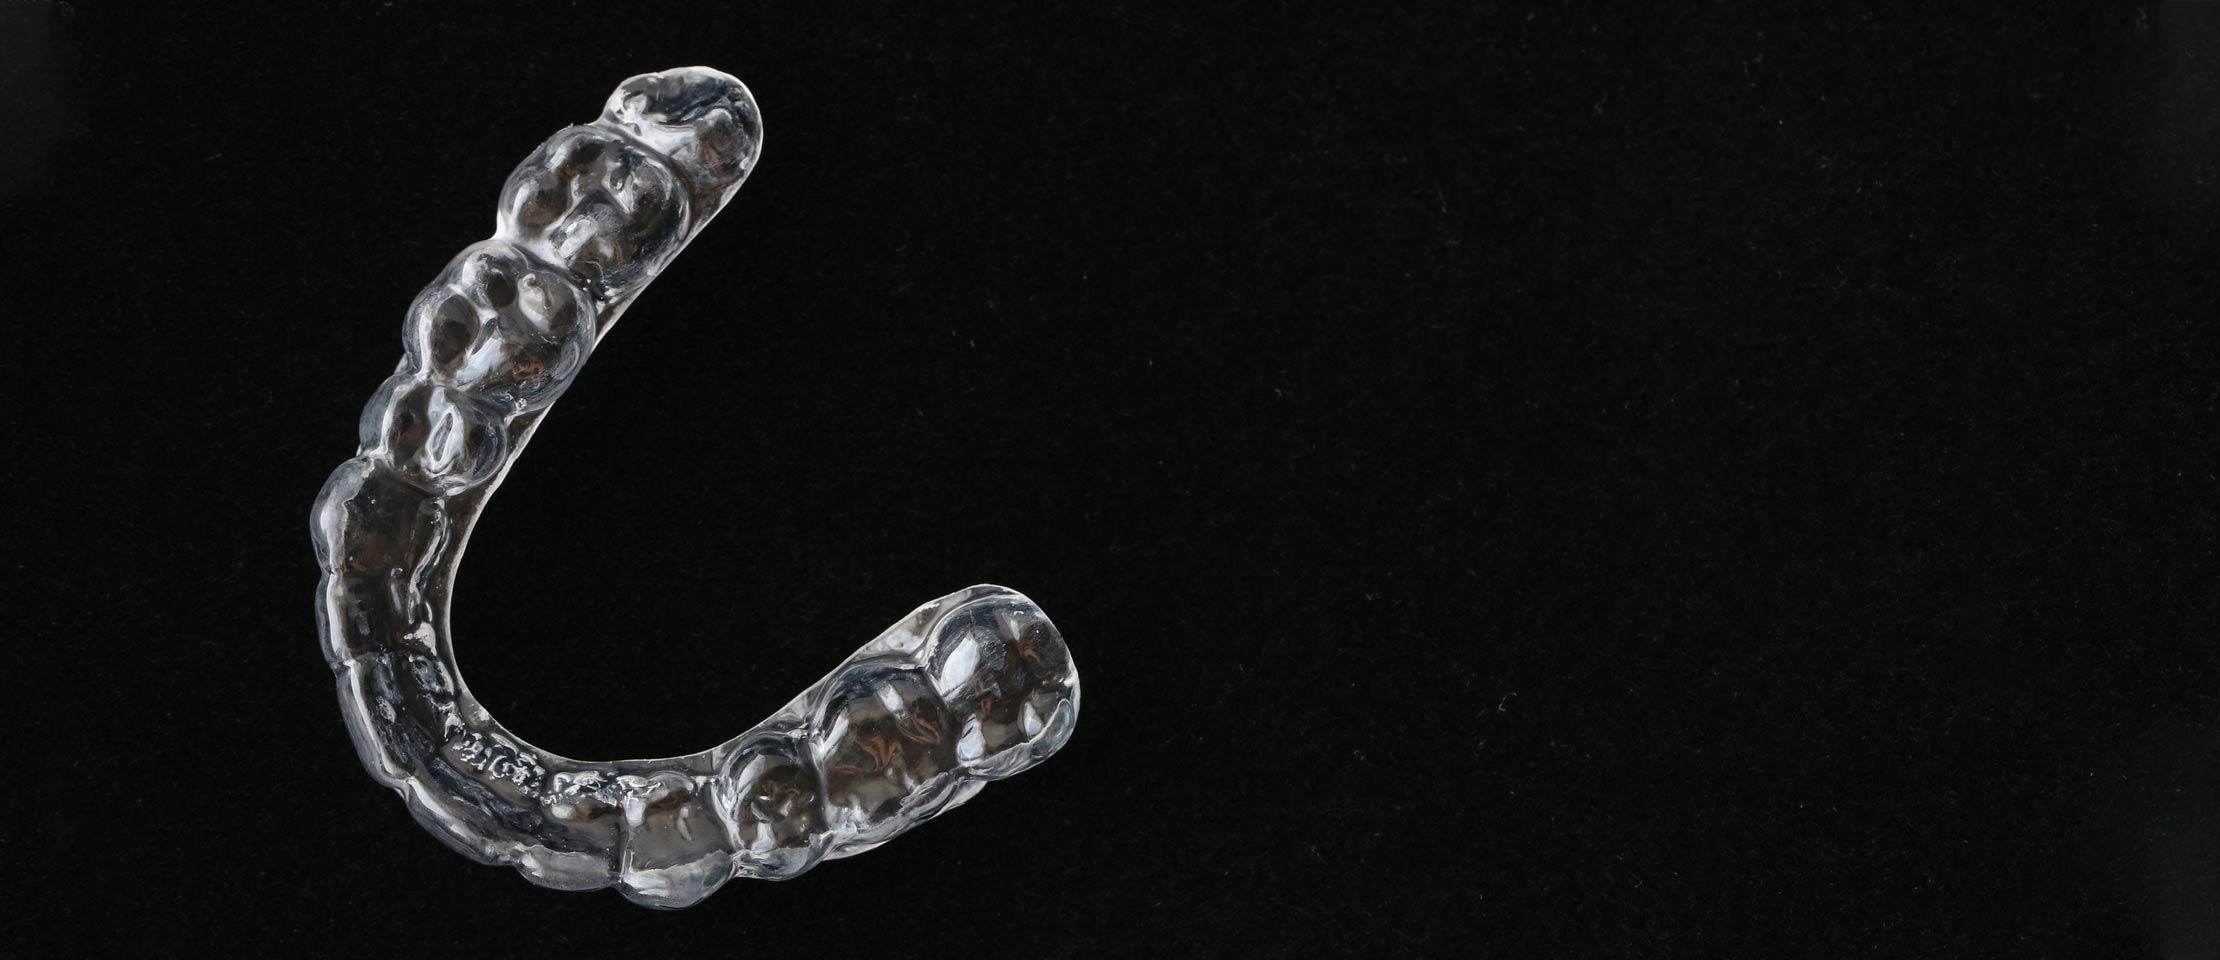 bruxisme dentaire